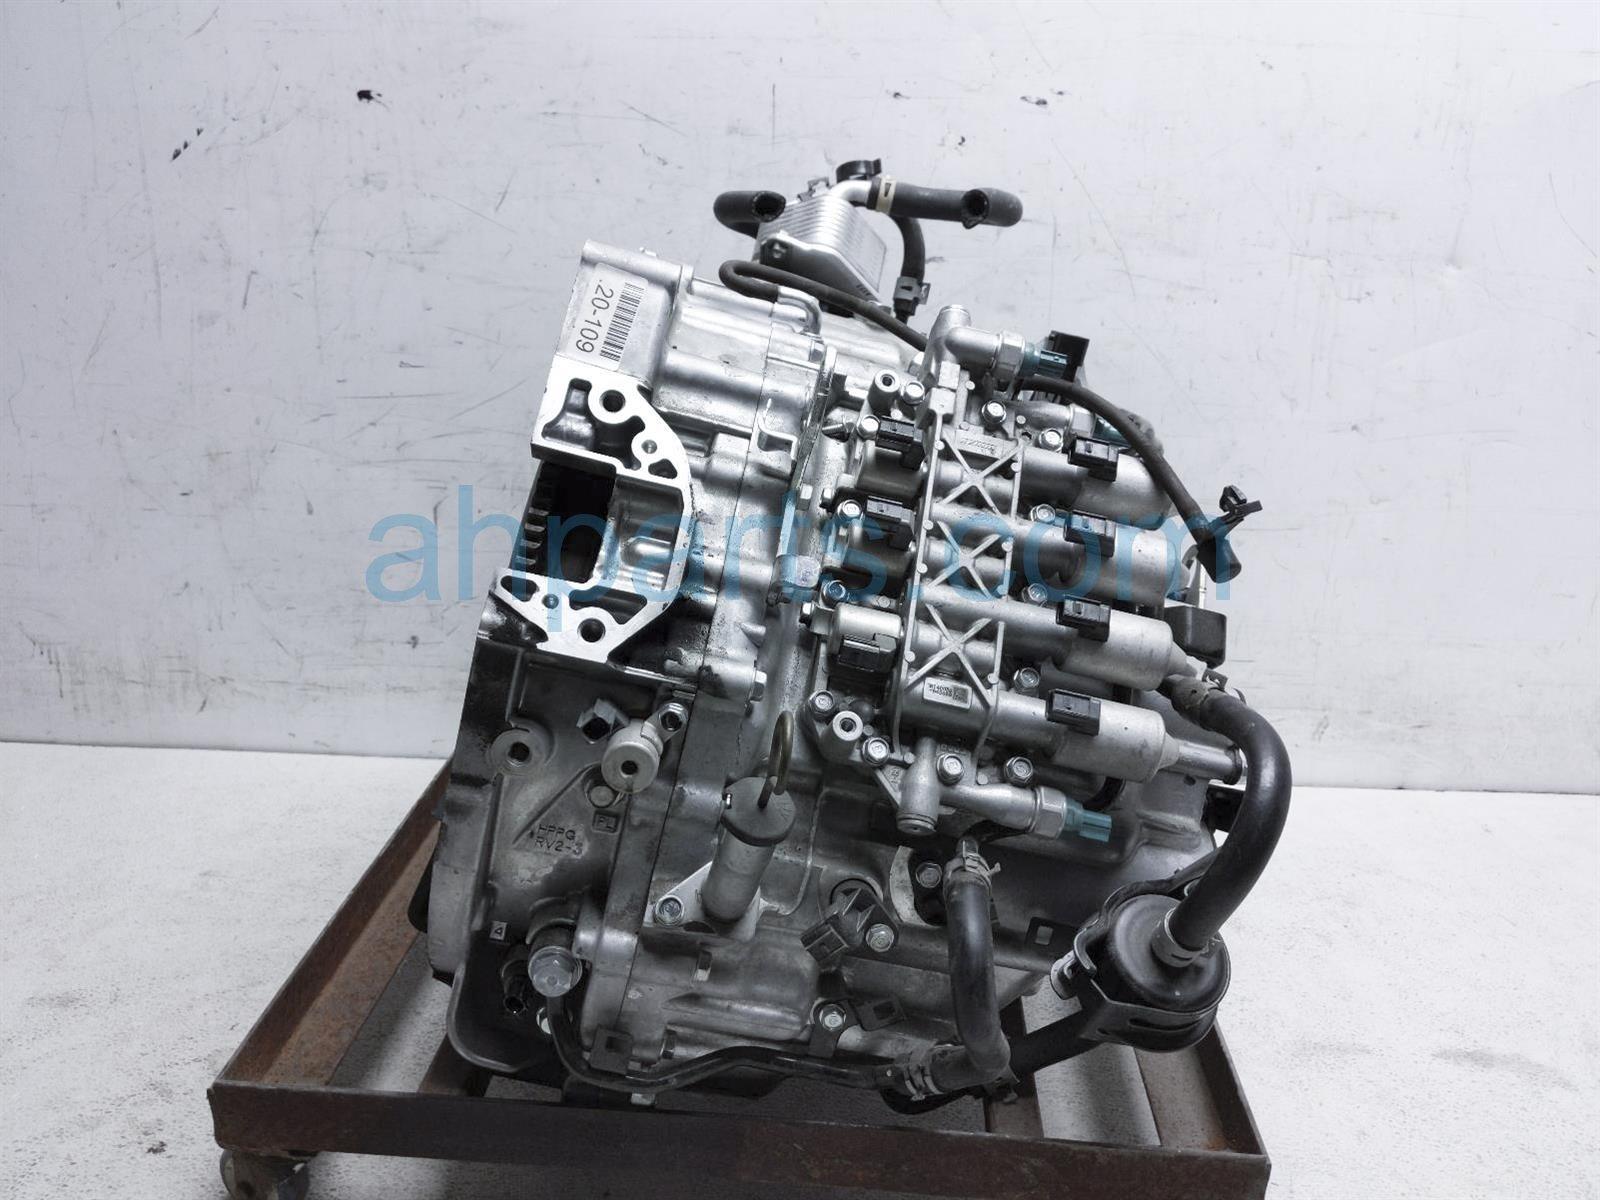 2019 Honda Pilot At Transmission = 114k Miles   Fwd 20021 RLW 000 Replacement